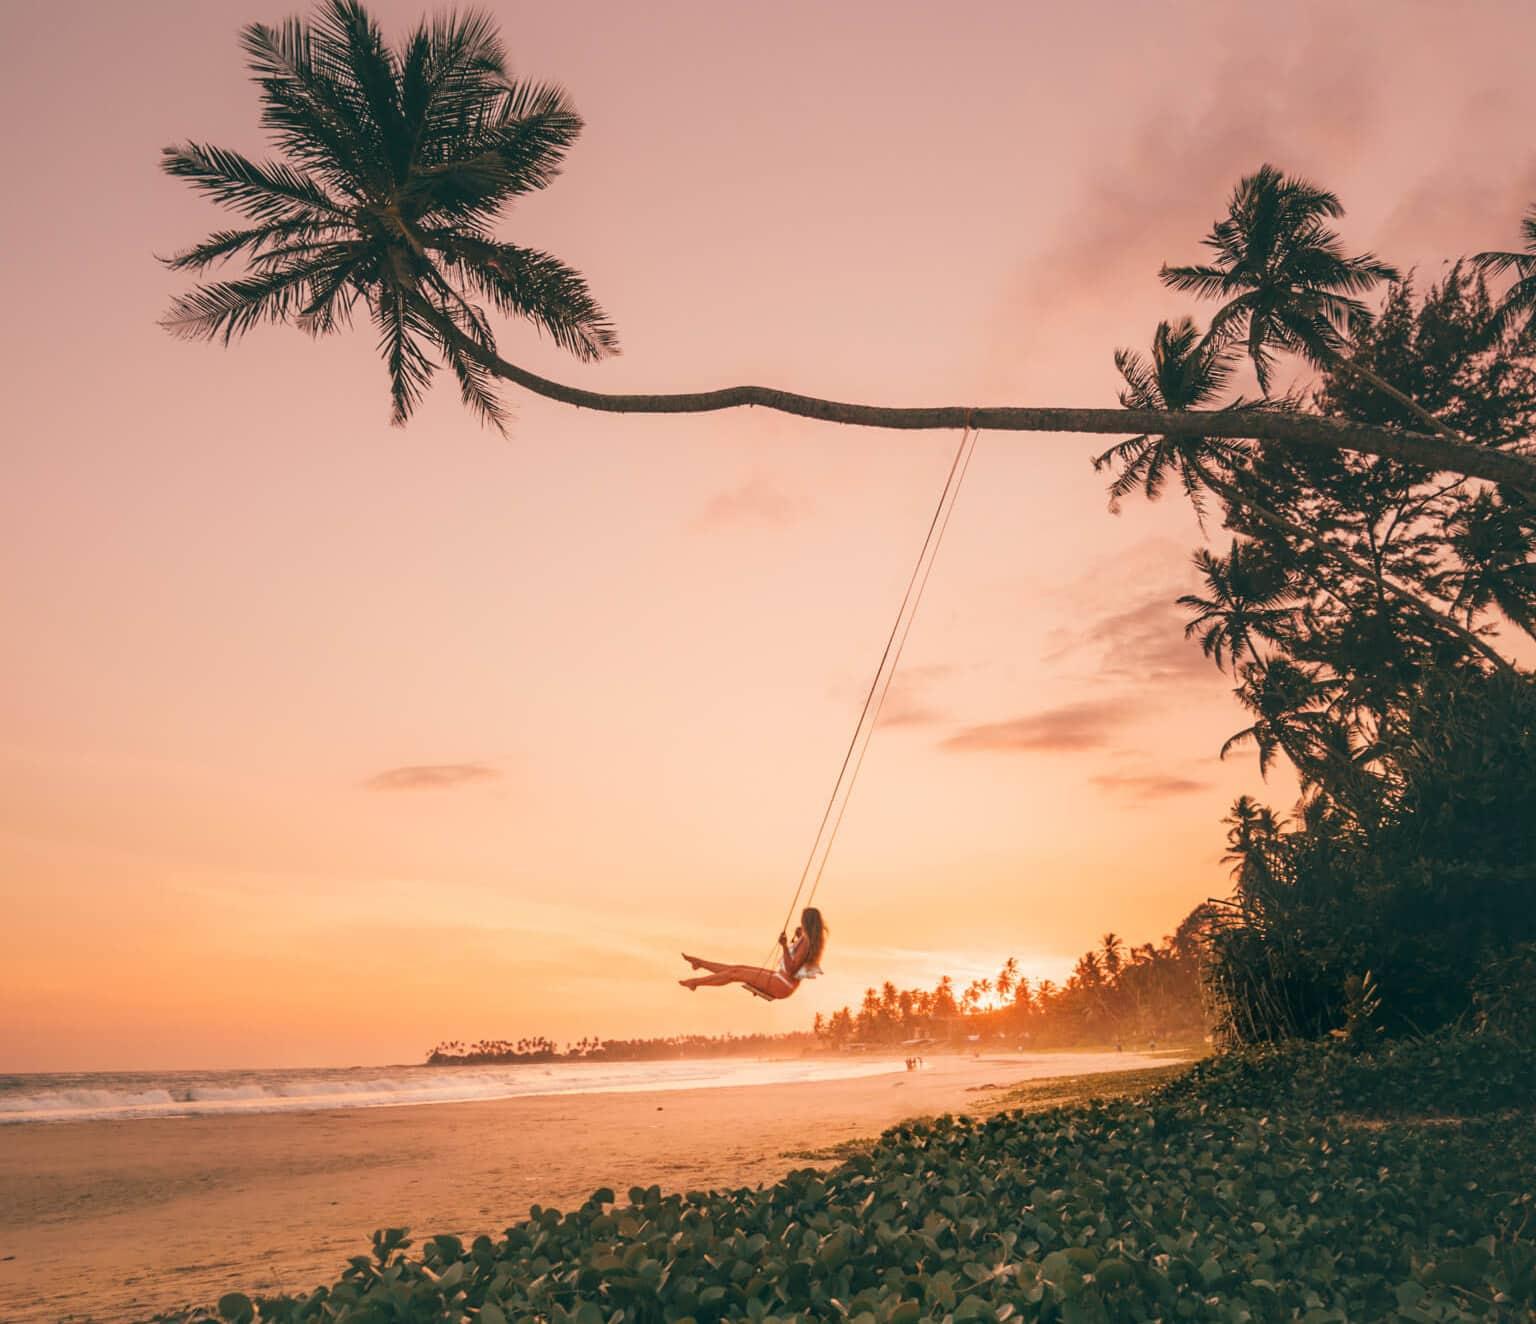 Hiriketiya Dikwella palm swing header